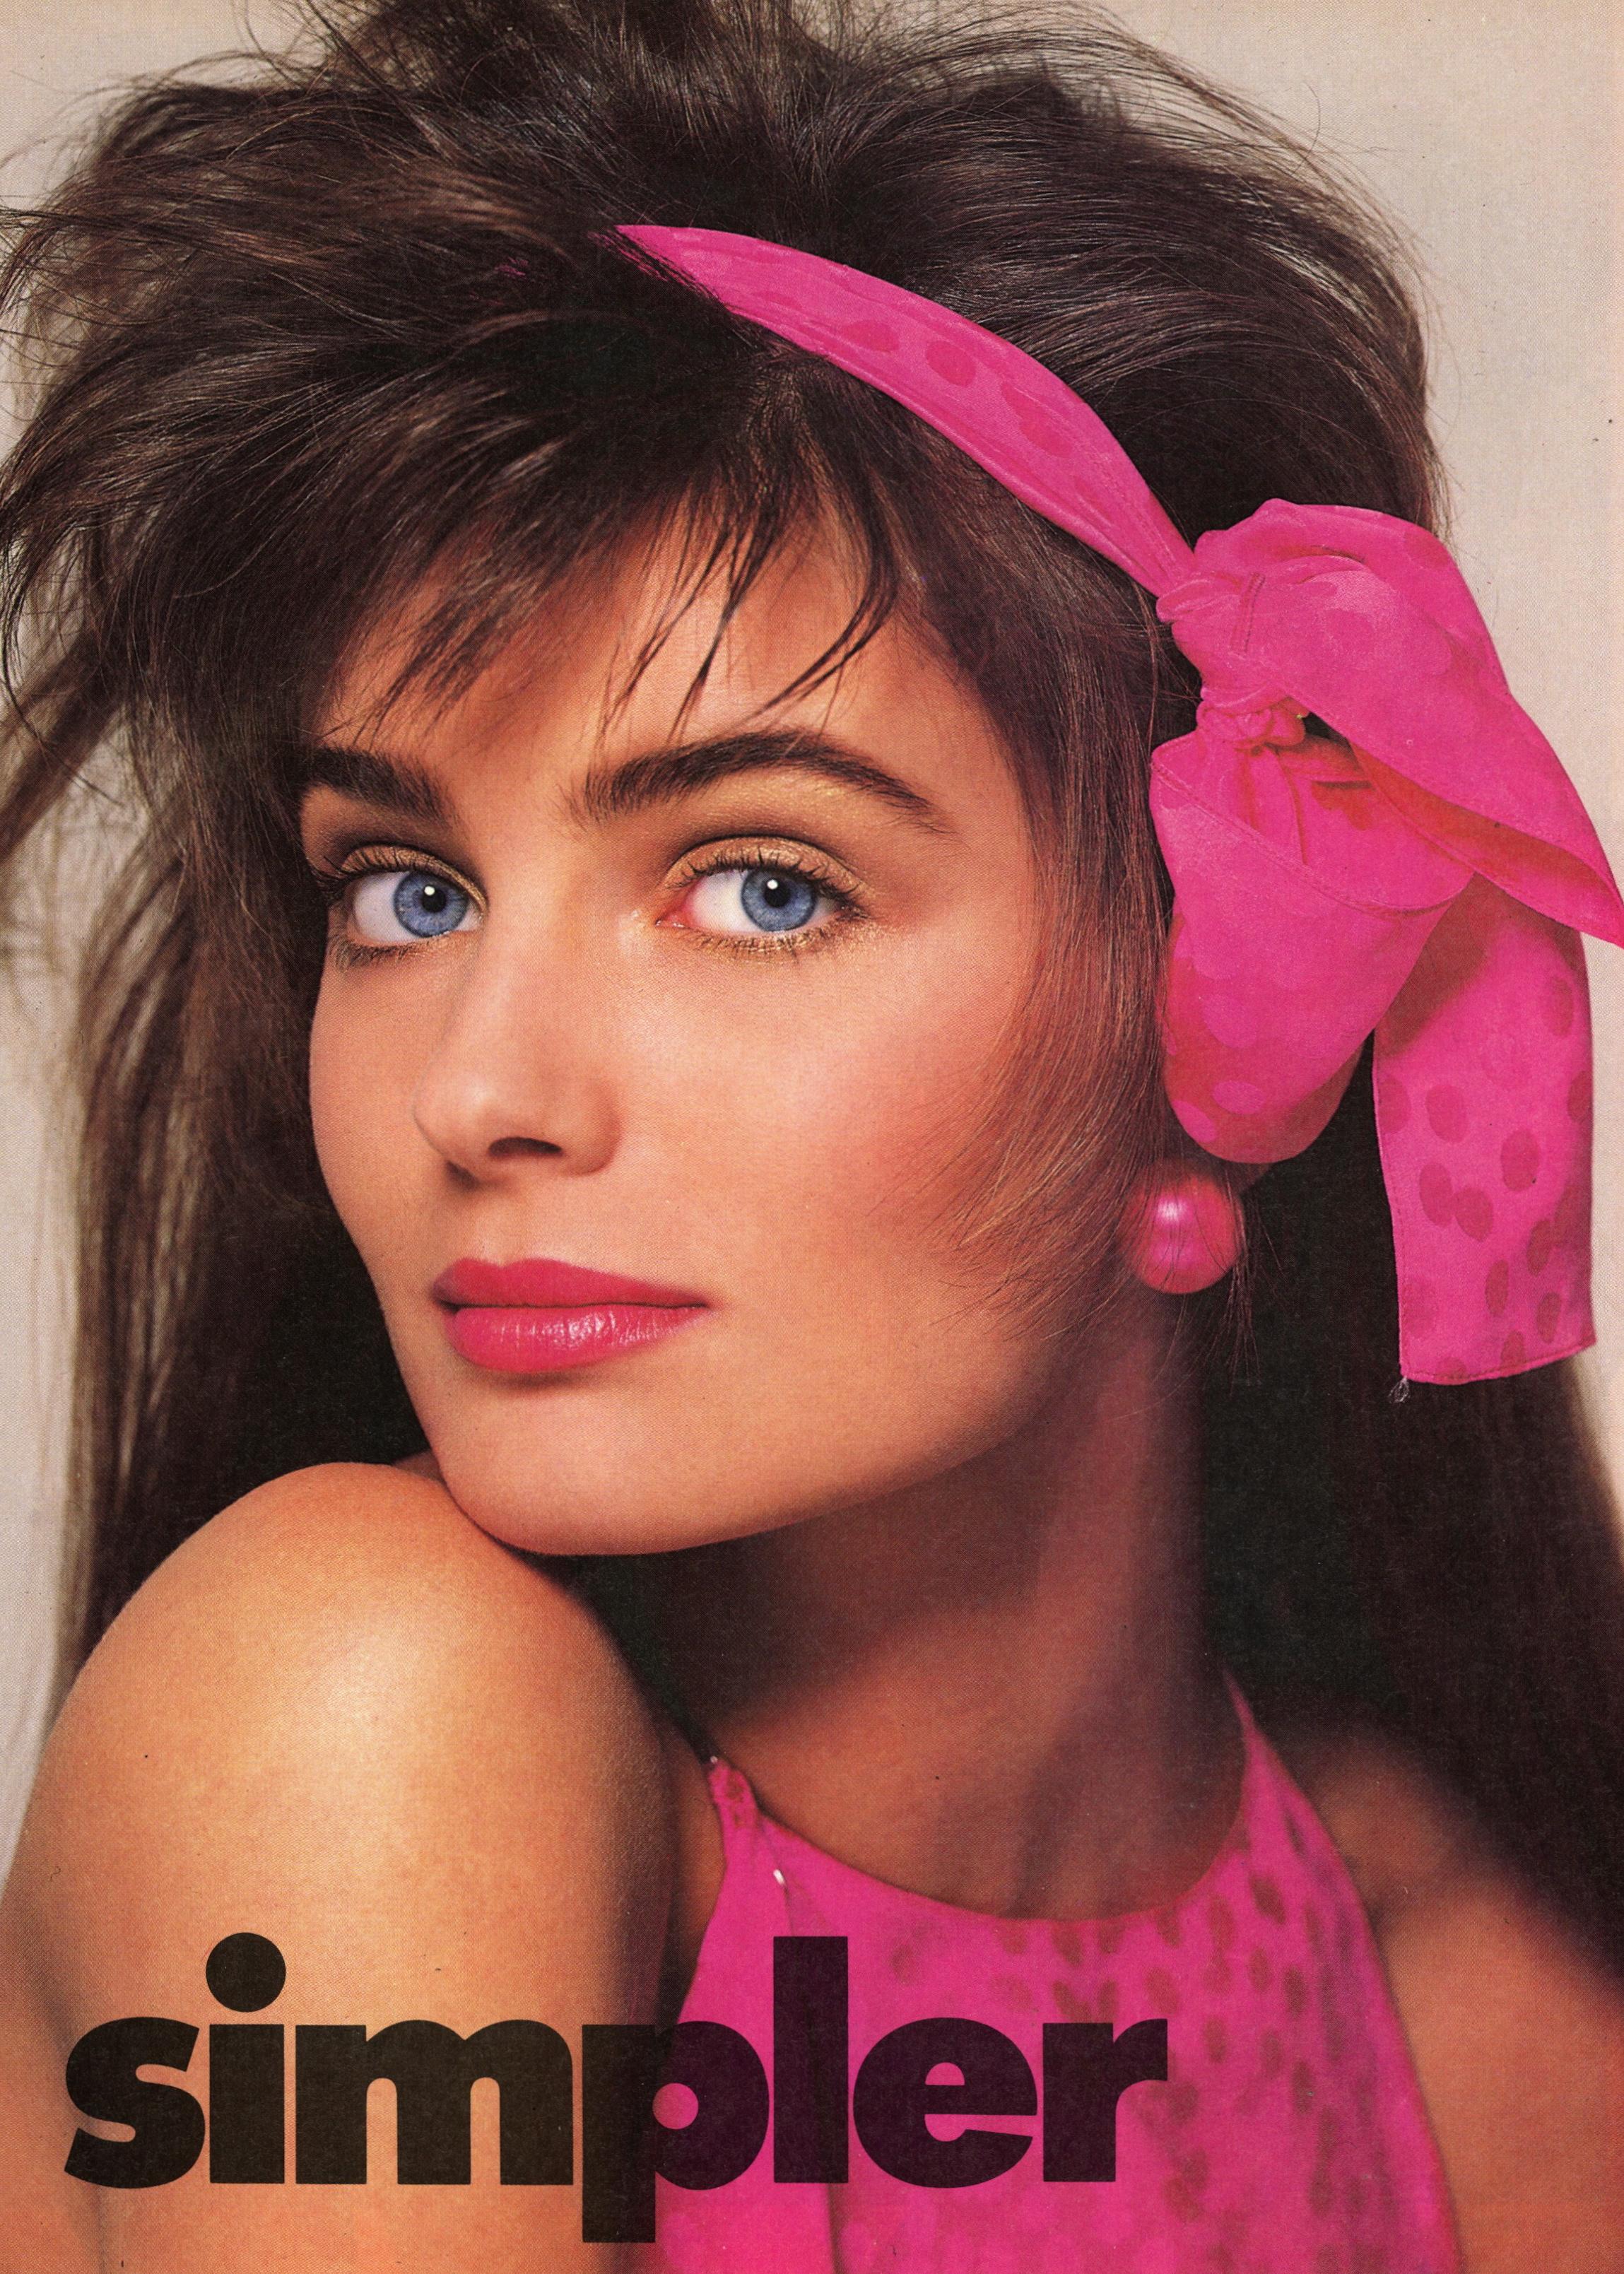 Vogue (US) June 1986 | Paulina Porizkova 04.jpg